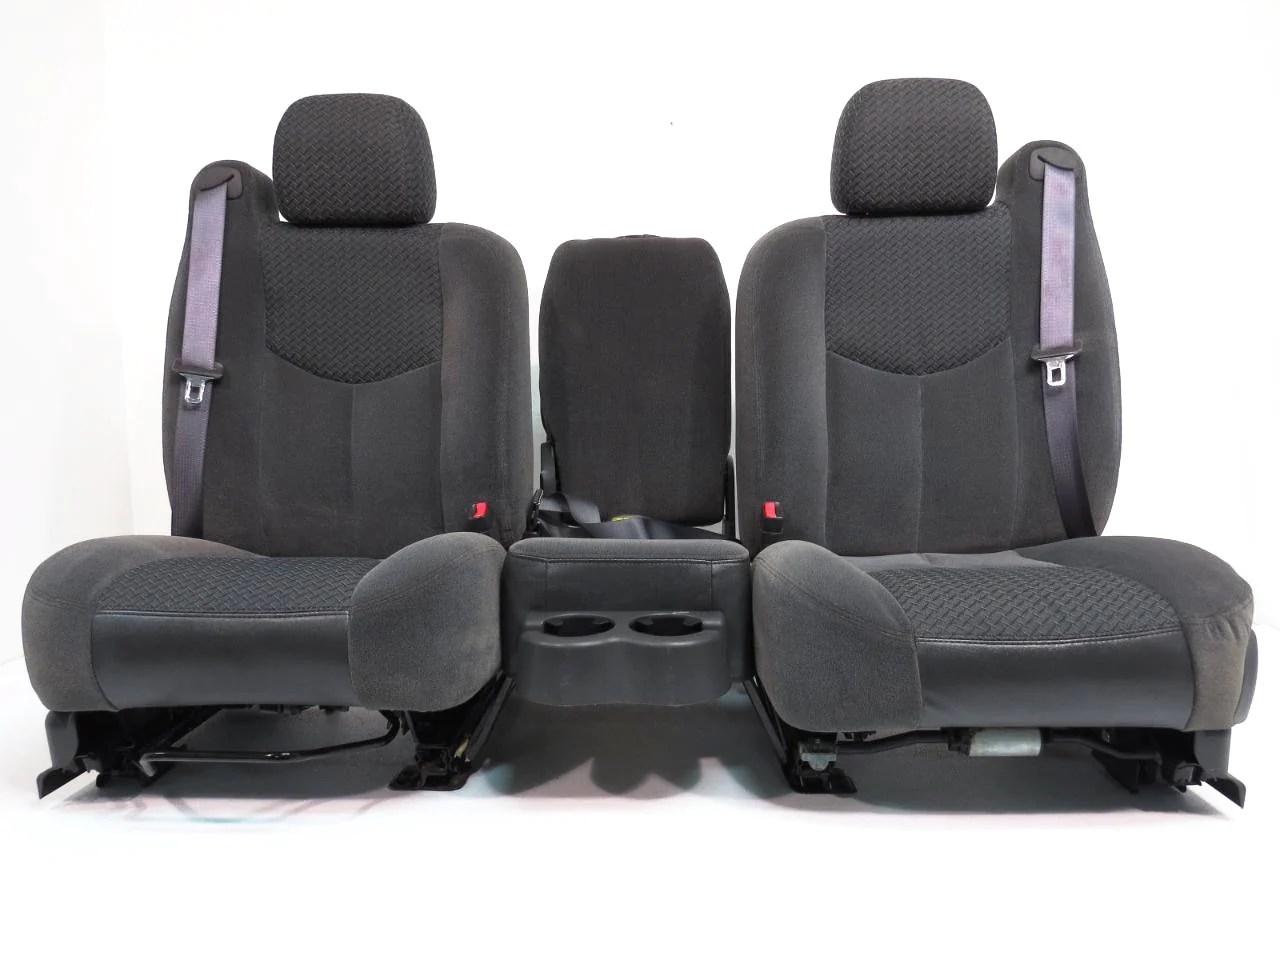 chevy gmc truck suv dark grey cloth front seats 2000 2001 2002 2003 2004 2005 2006  [ 1280 x 960 Pixel ]